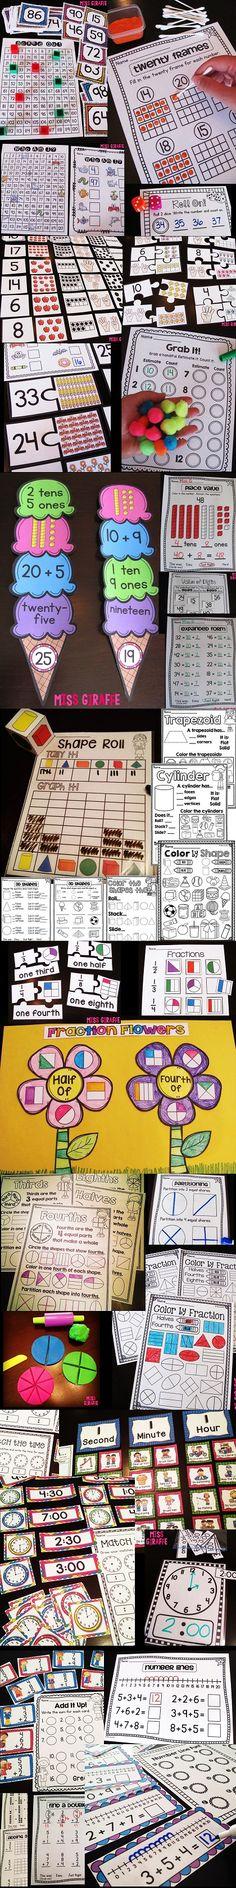 First grade math centers, worksheets, and ideas. Second Grade Math, First Grade Classroom, Math Classroom, Grade 1, Math Strategies, Math Resources, Math Activities, Math Games, Math Intervention